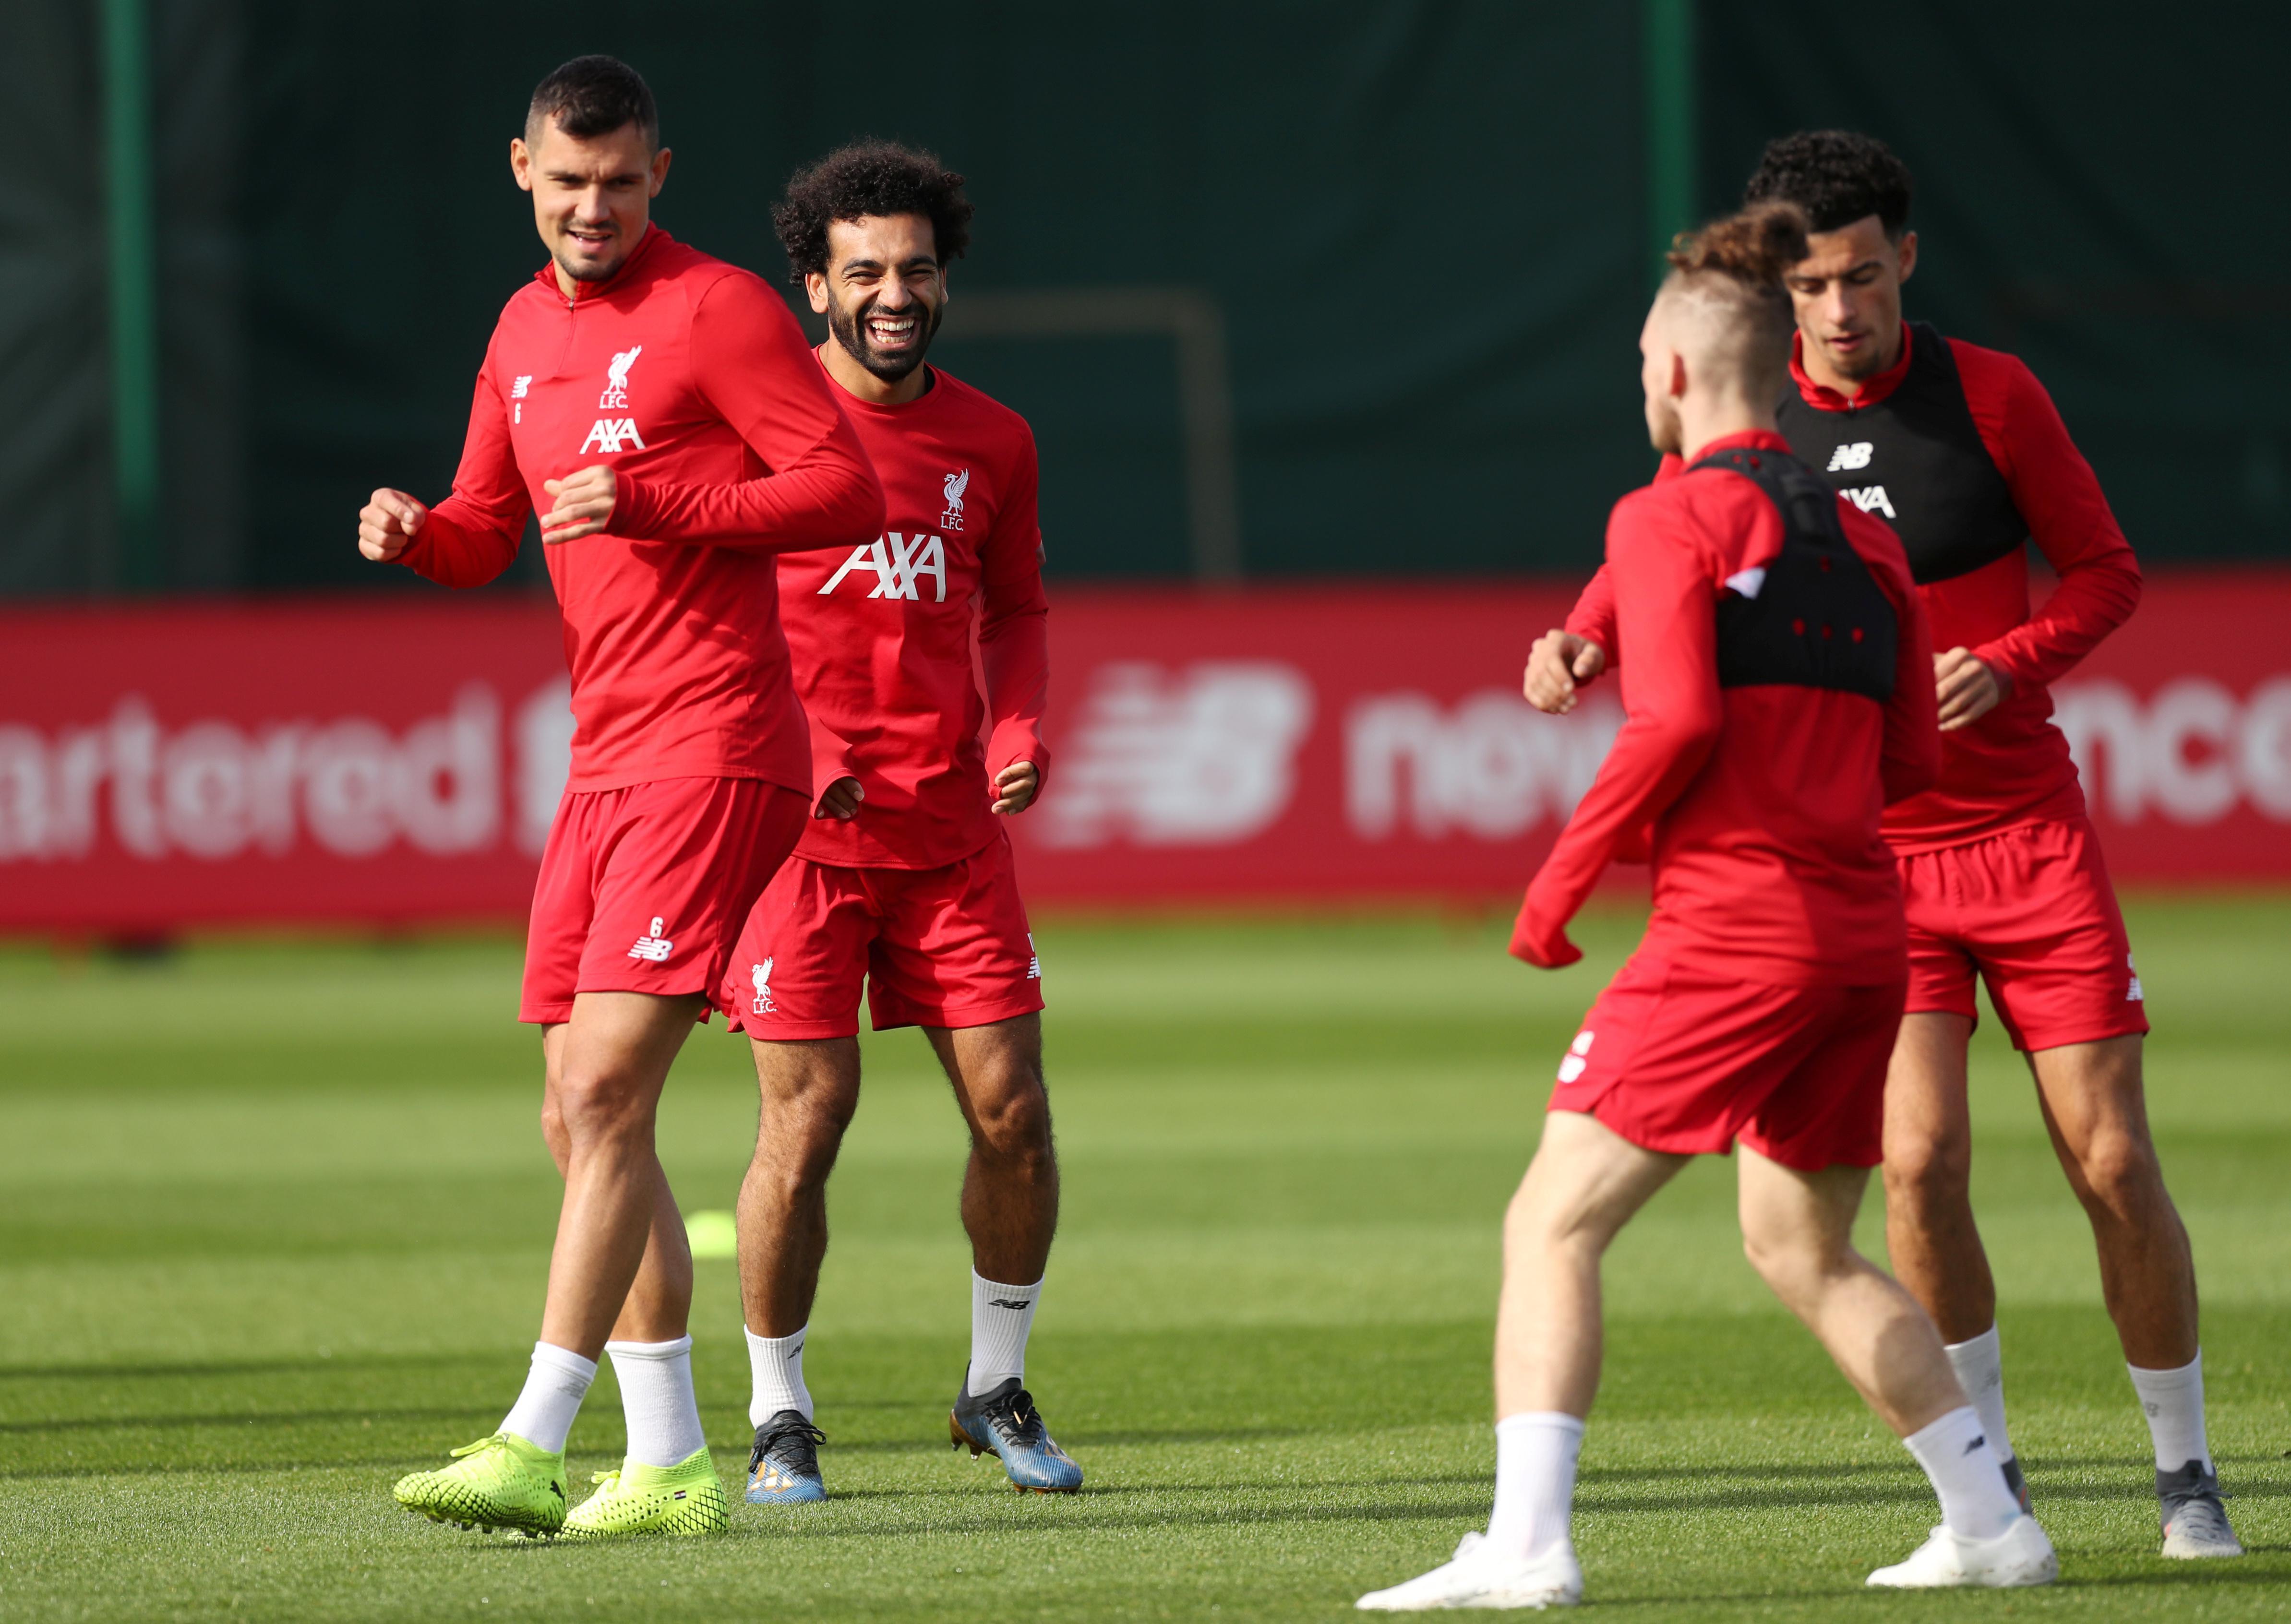 Liverpool 'bottled it' last season, says former striker Diouf